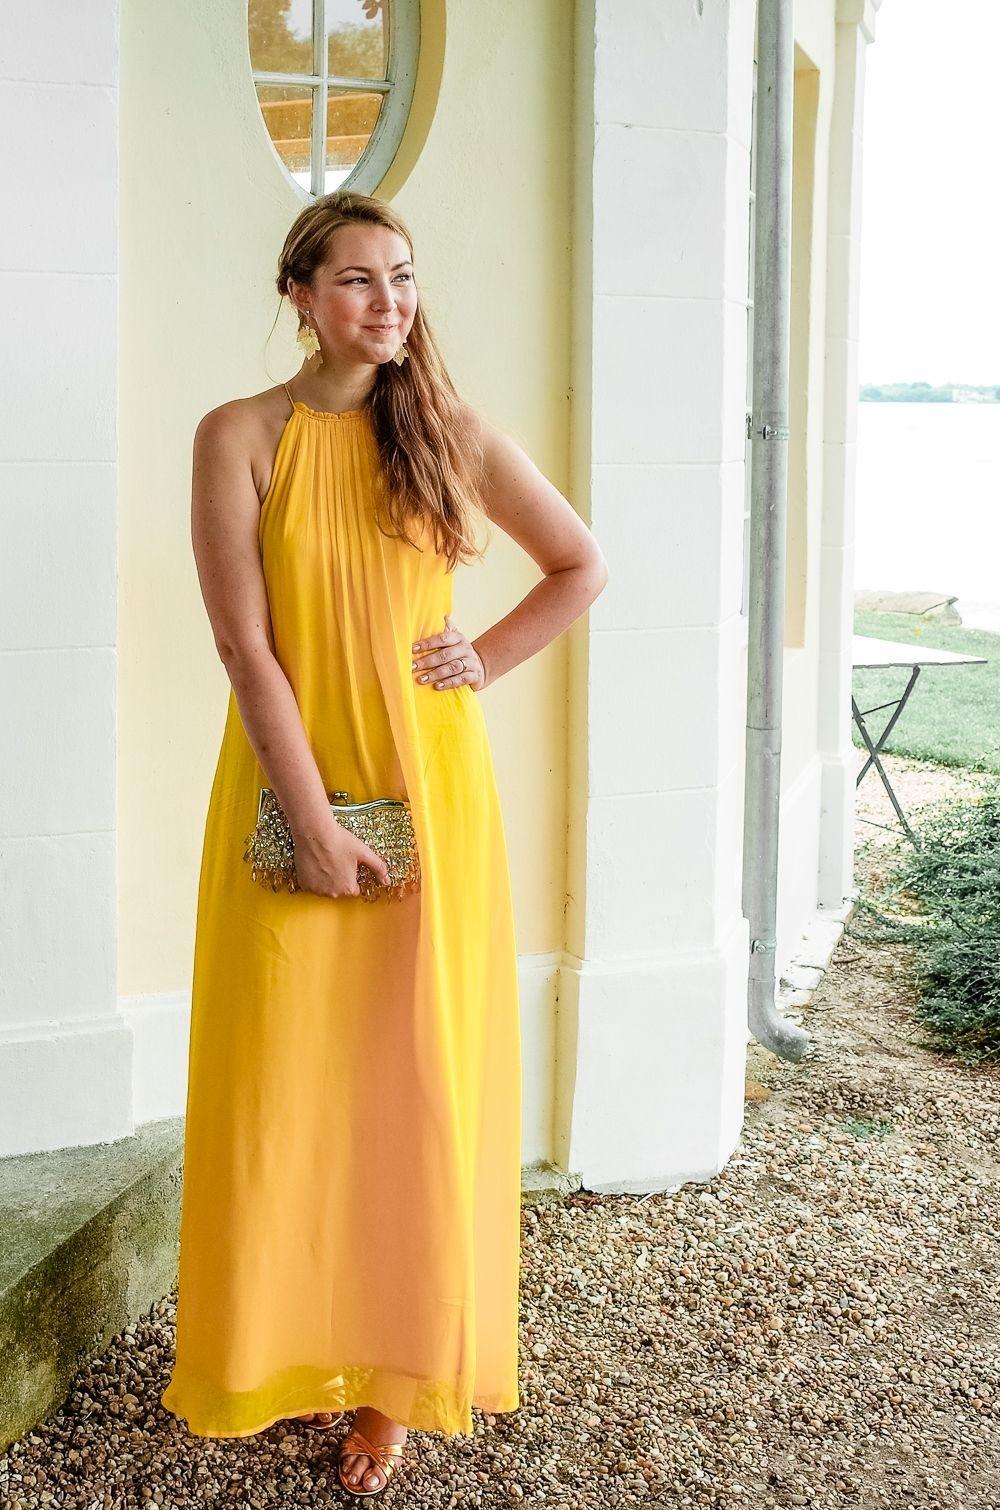 20 Perfekt Strandkleid Hochzeit Spezialgebiet10 Schön Strandkleid Hochzeit Boutique